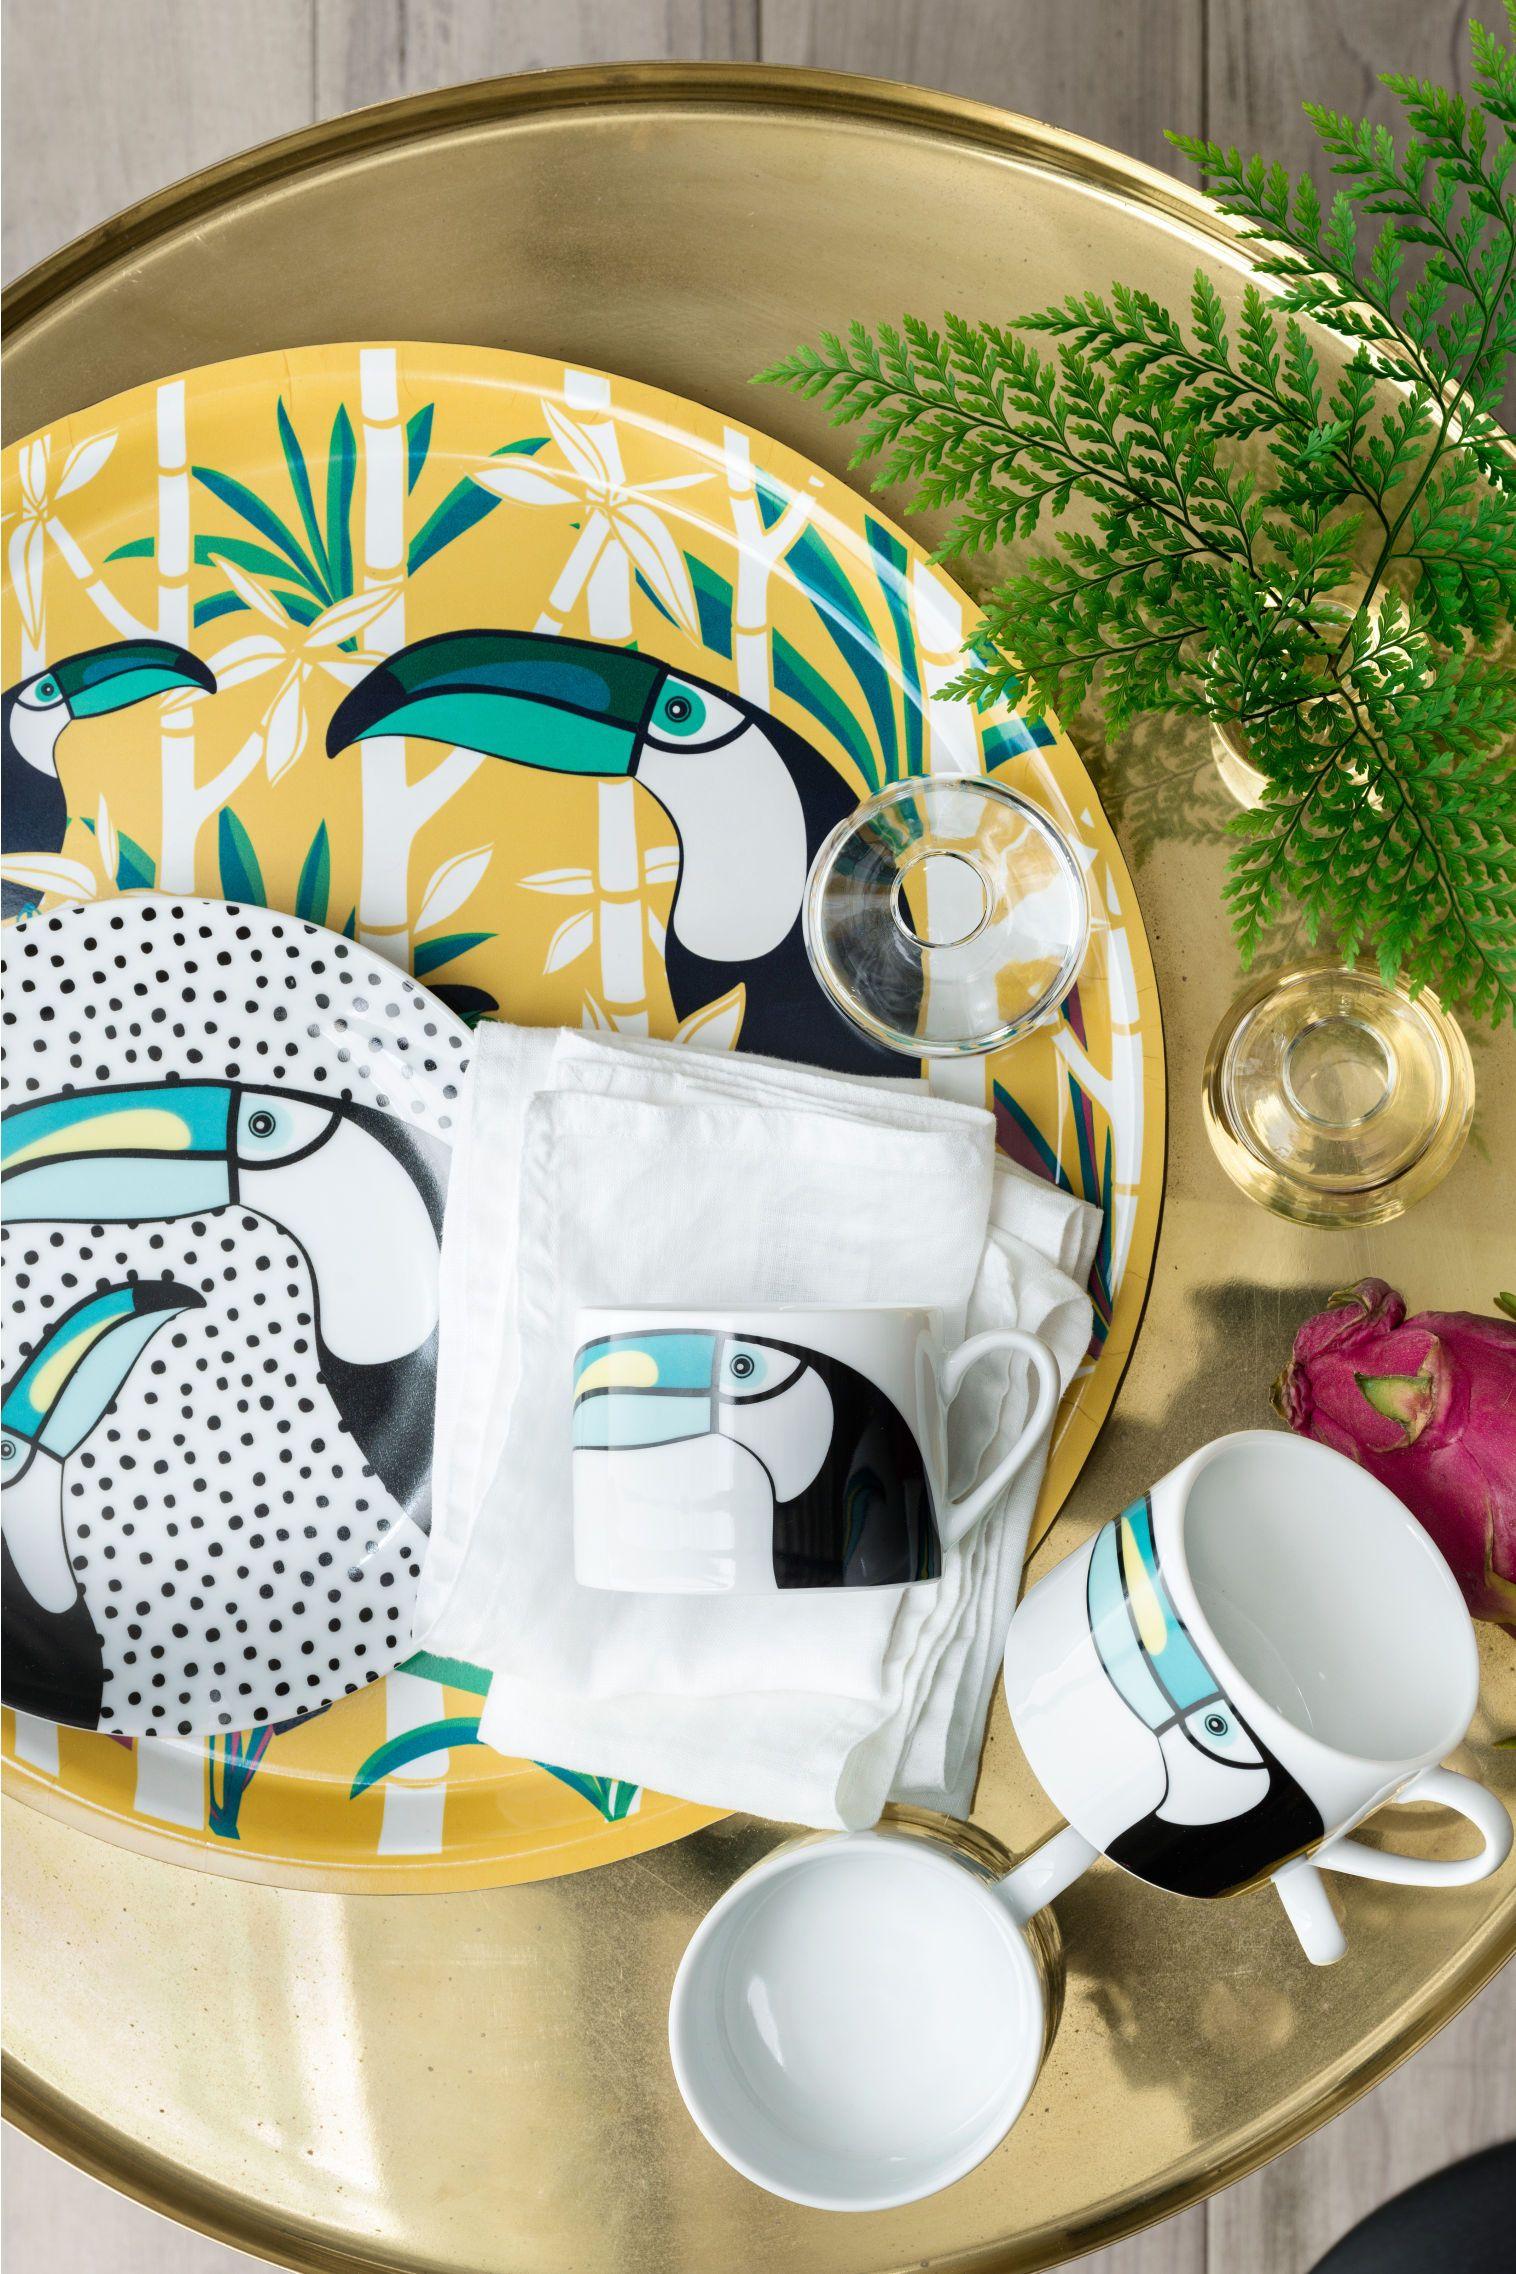 plateau motif h m home spring home home decor. Black Bedroom Furniture Sets. Home Design Ideas